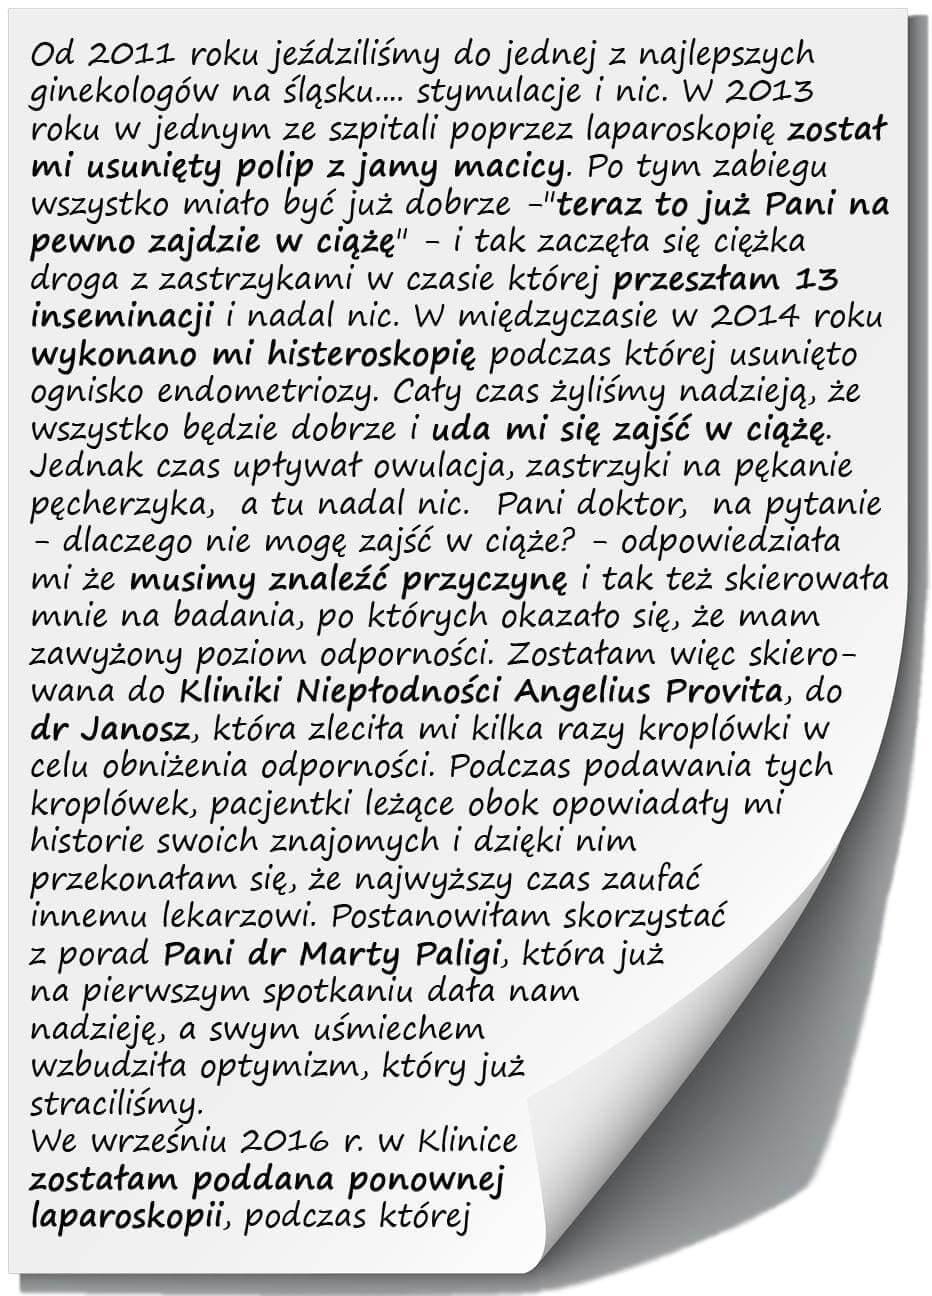 Historia Lidii i Krzysztofa